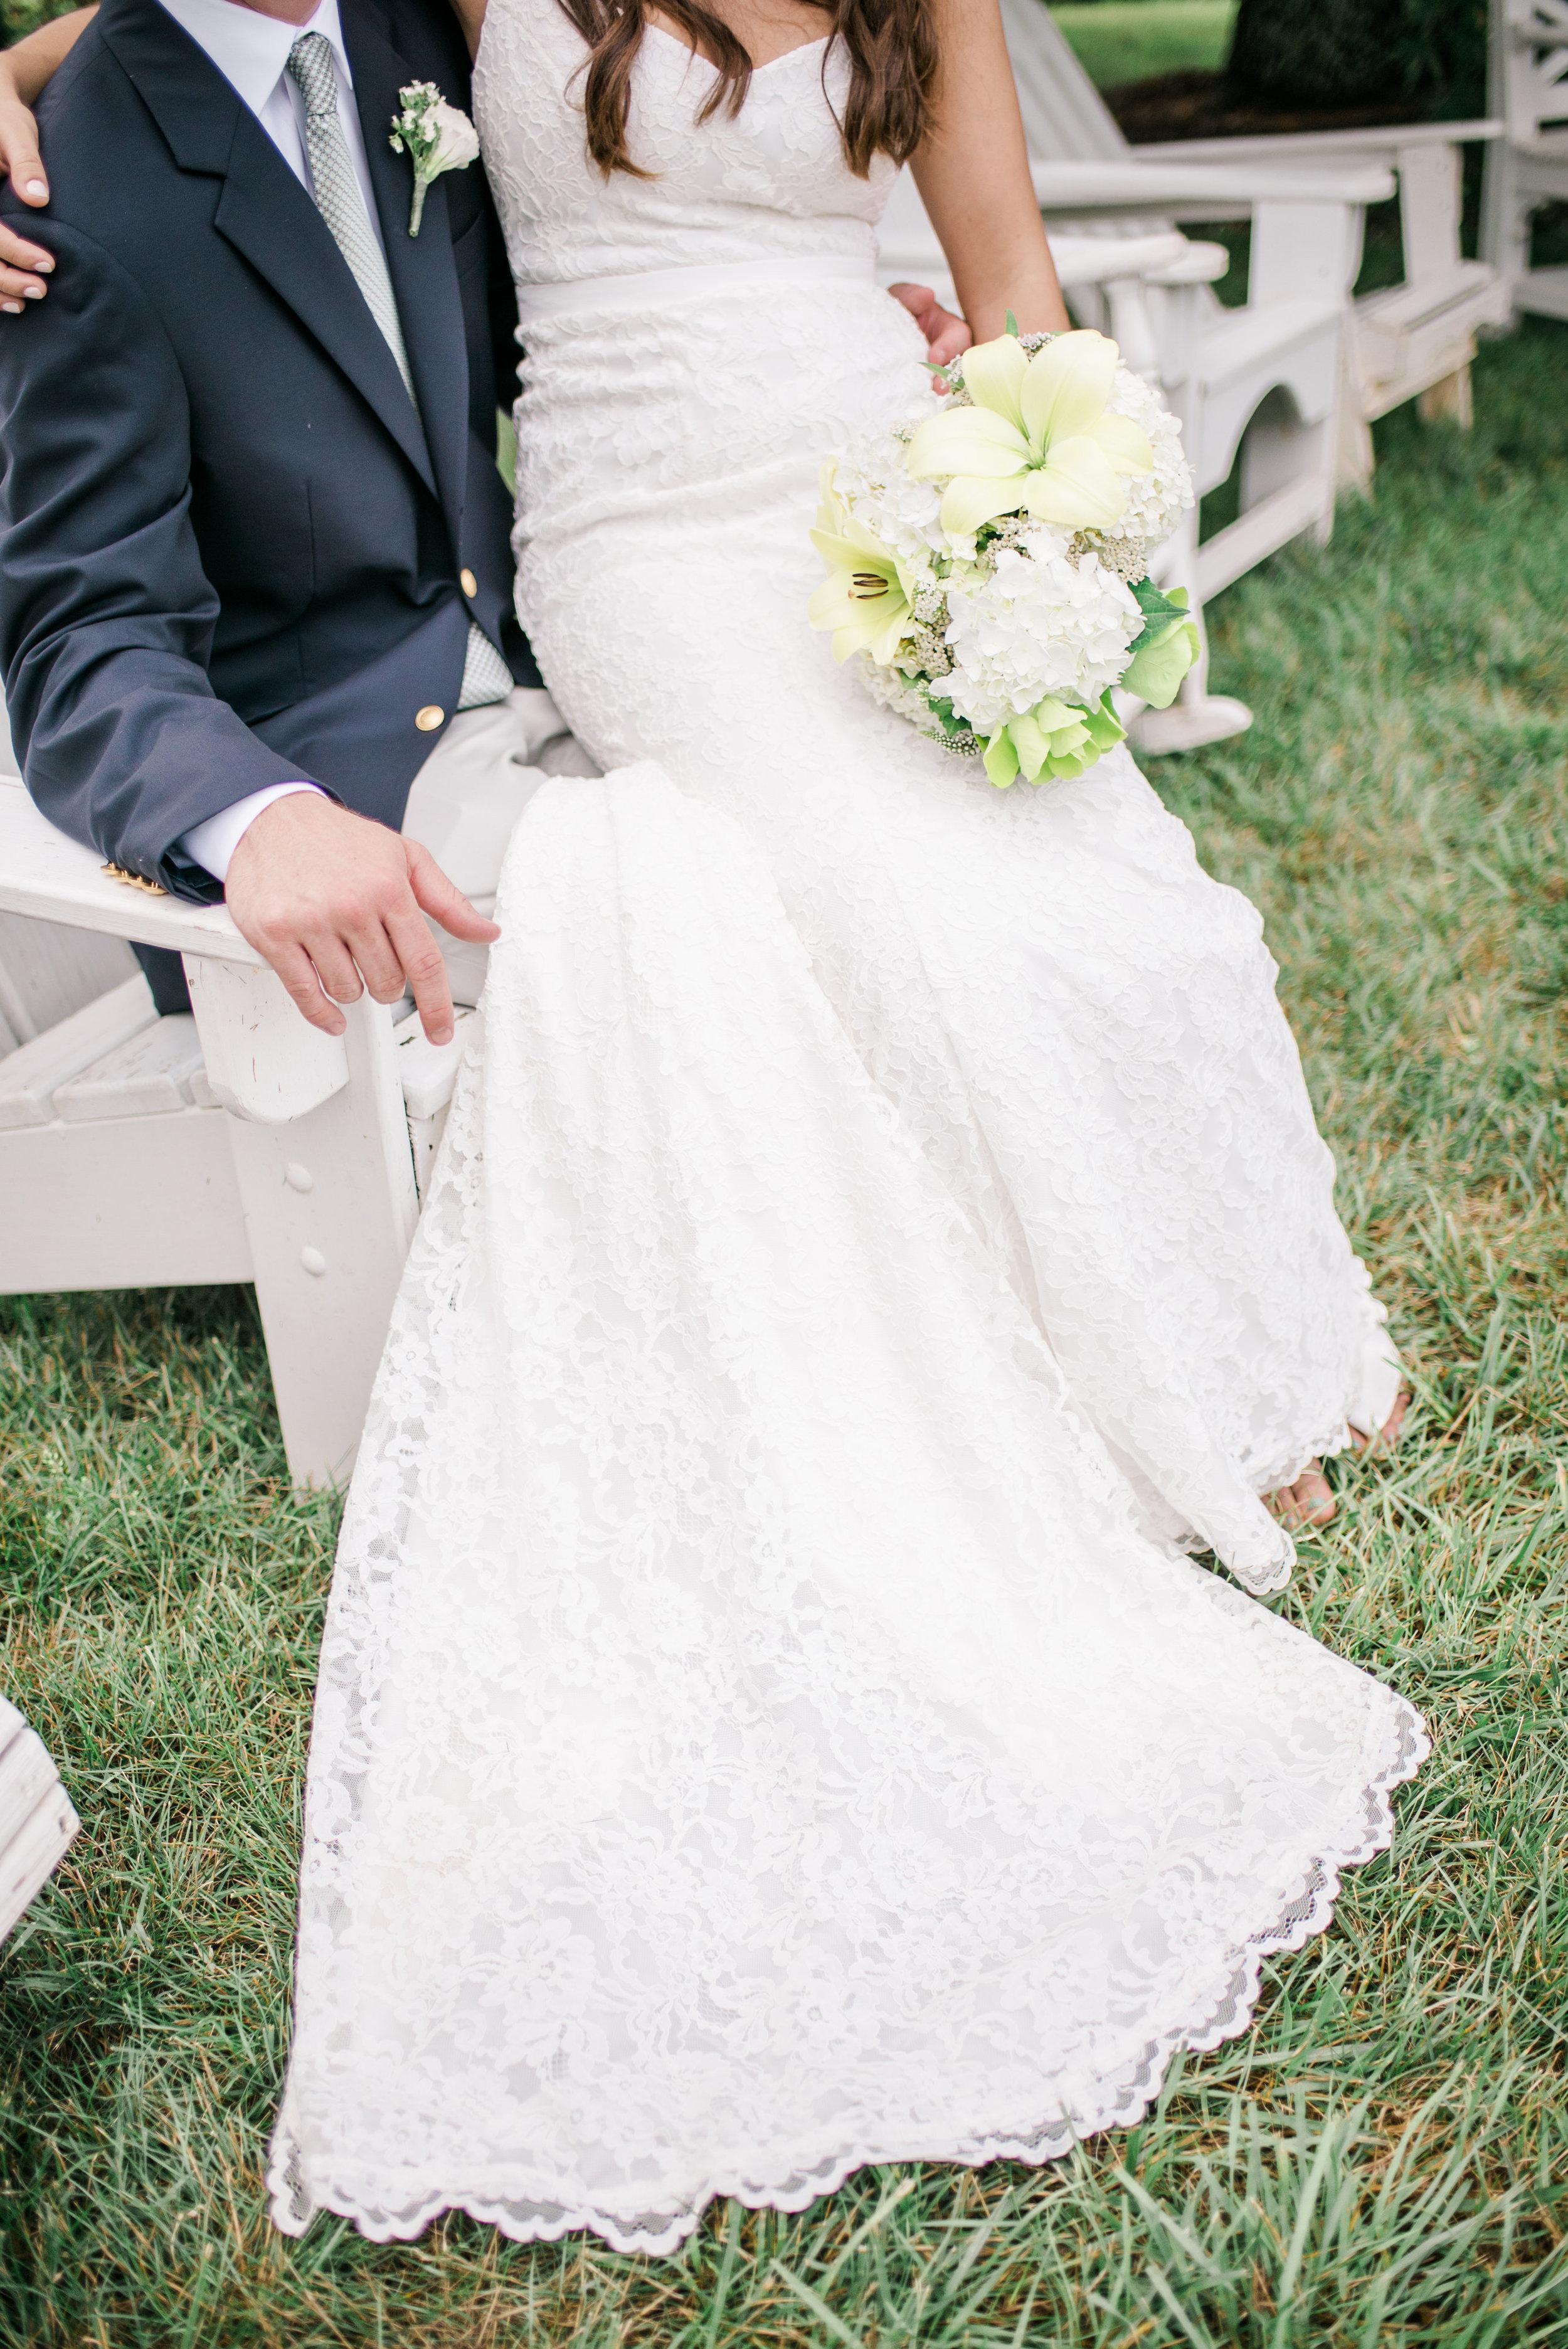 062715-Hannah+Drew-pharsalia-wedding-kathryn-ivy-photography-103.jpg